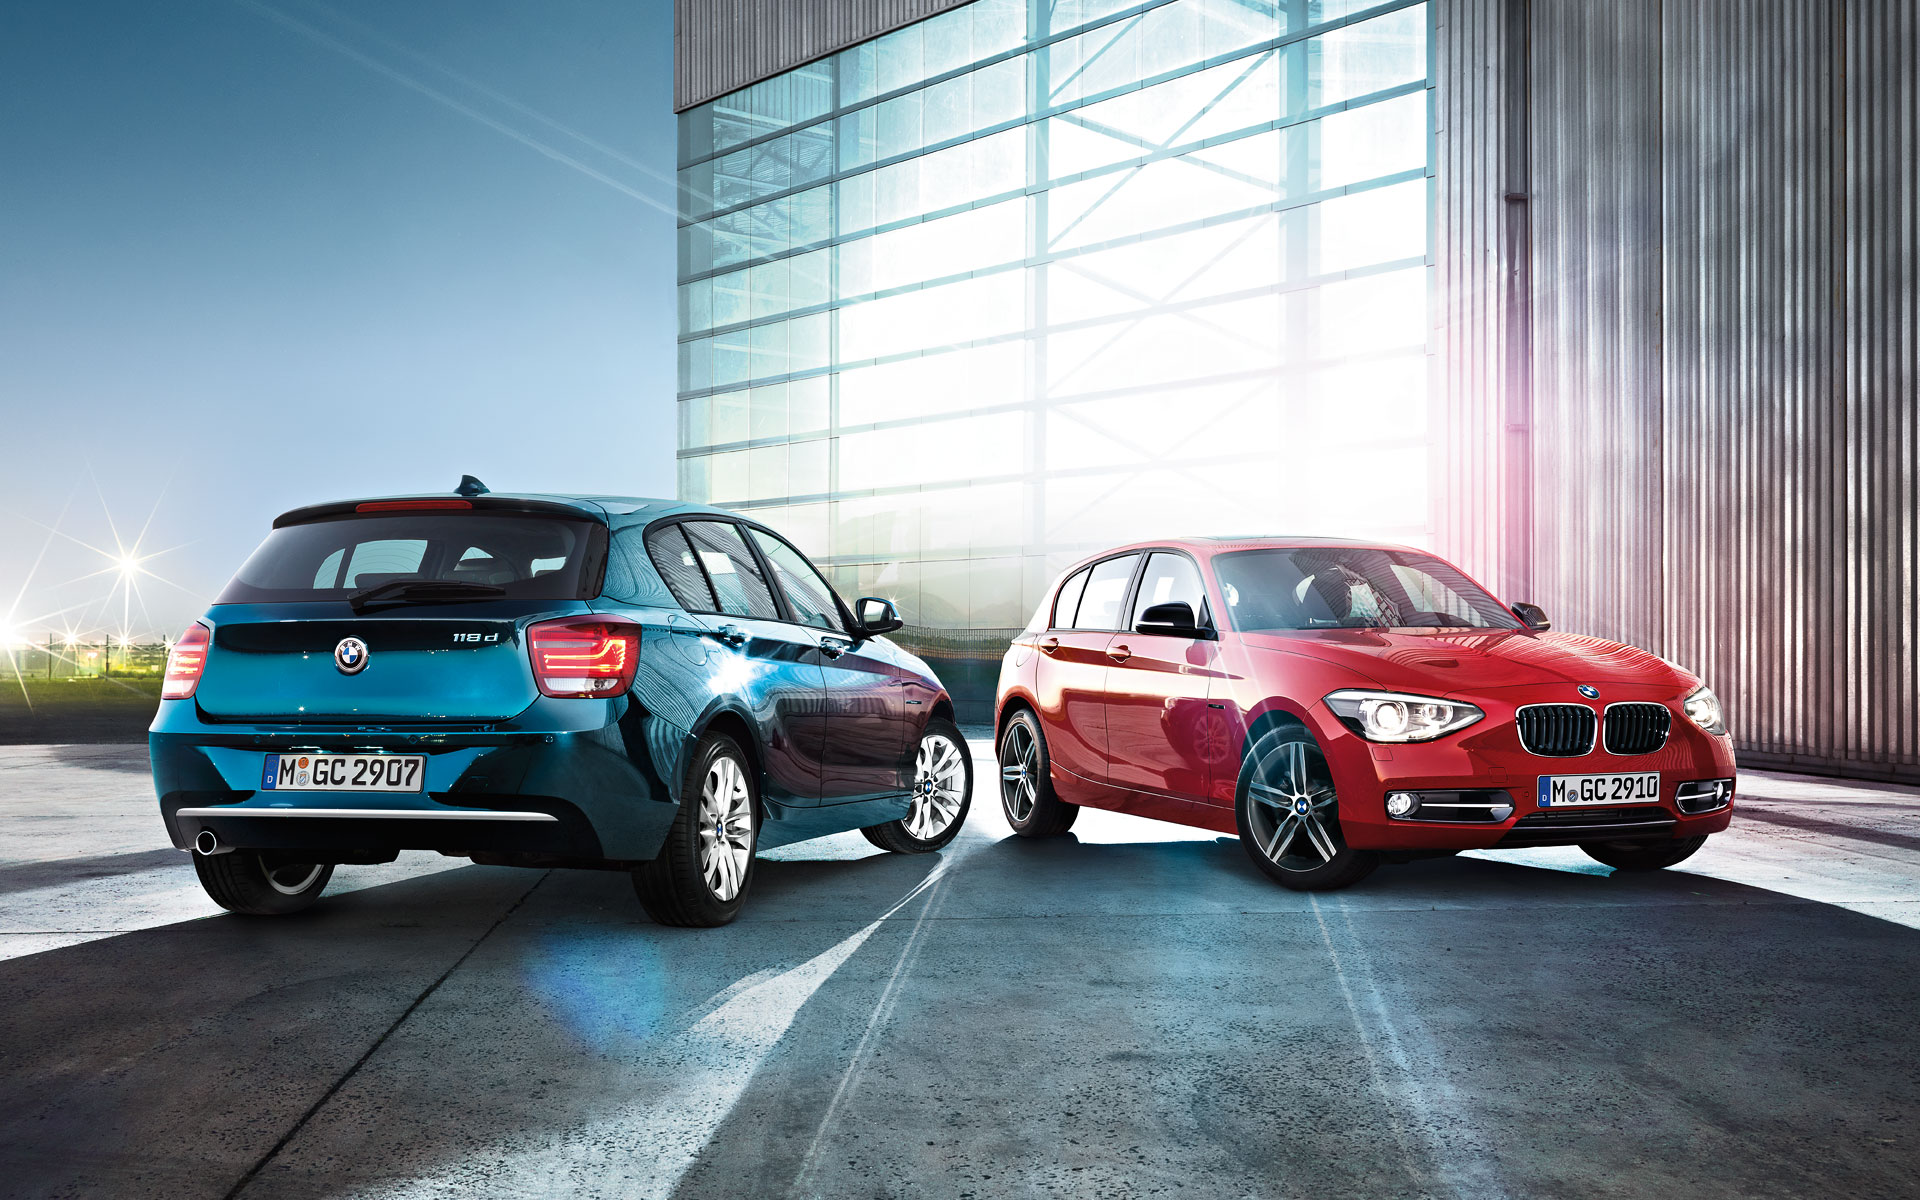 BMW_1series_wallpaper_01_1920_1200.jpg.resource.1373895740407.jpg